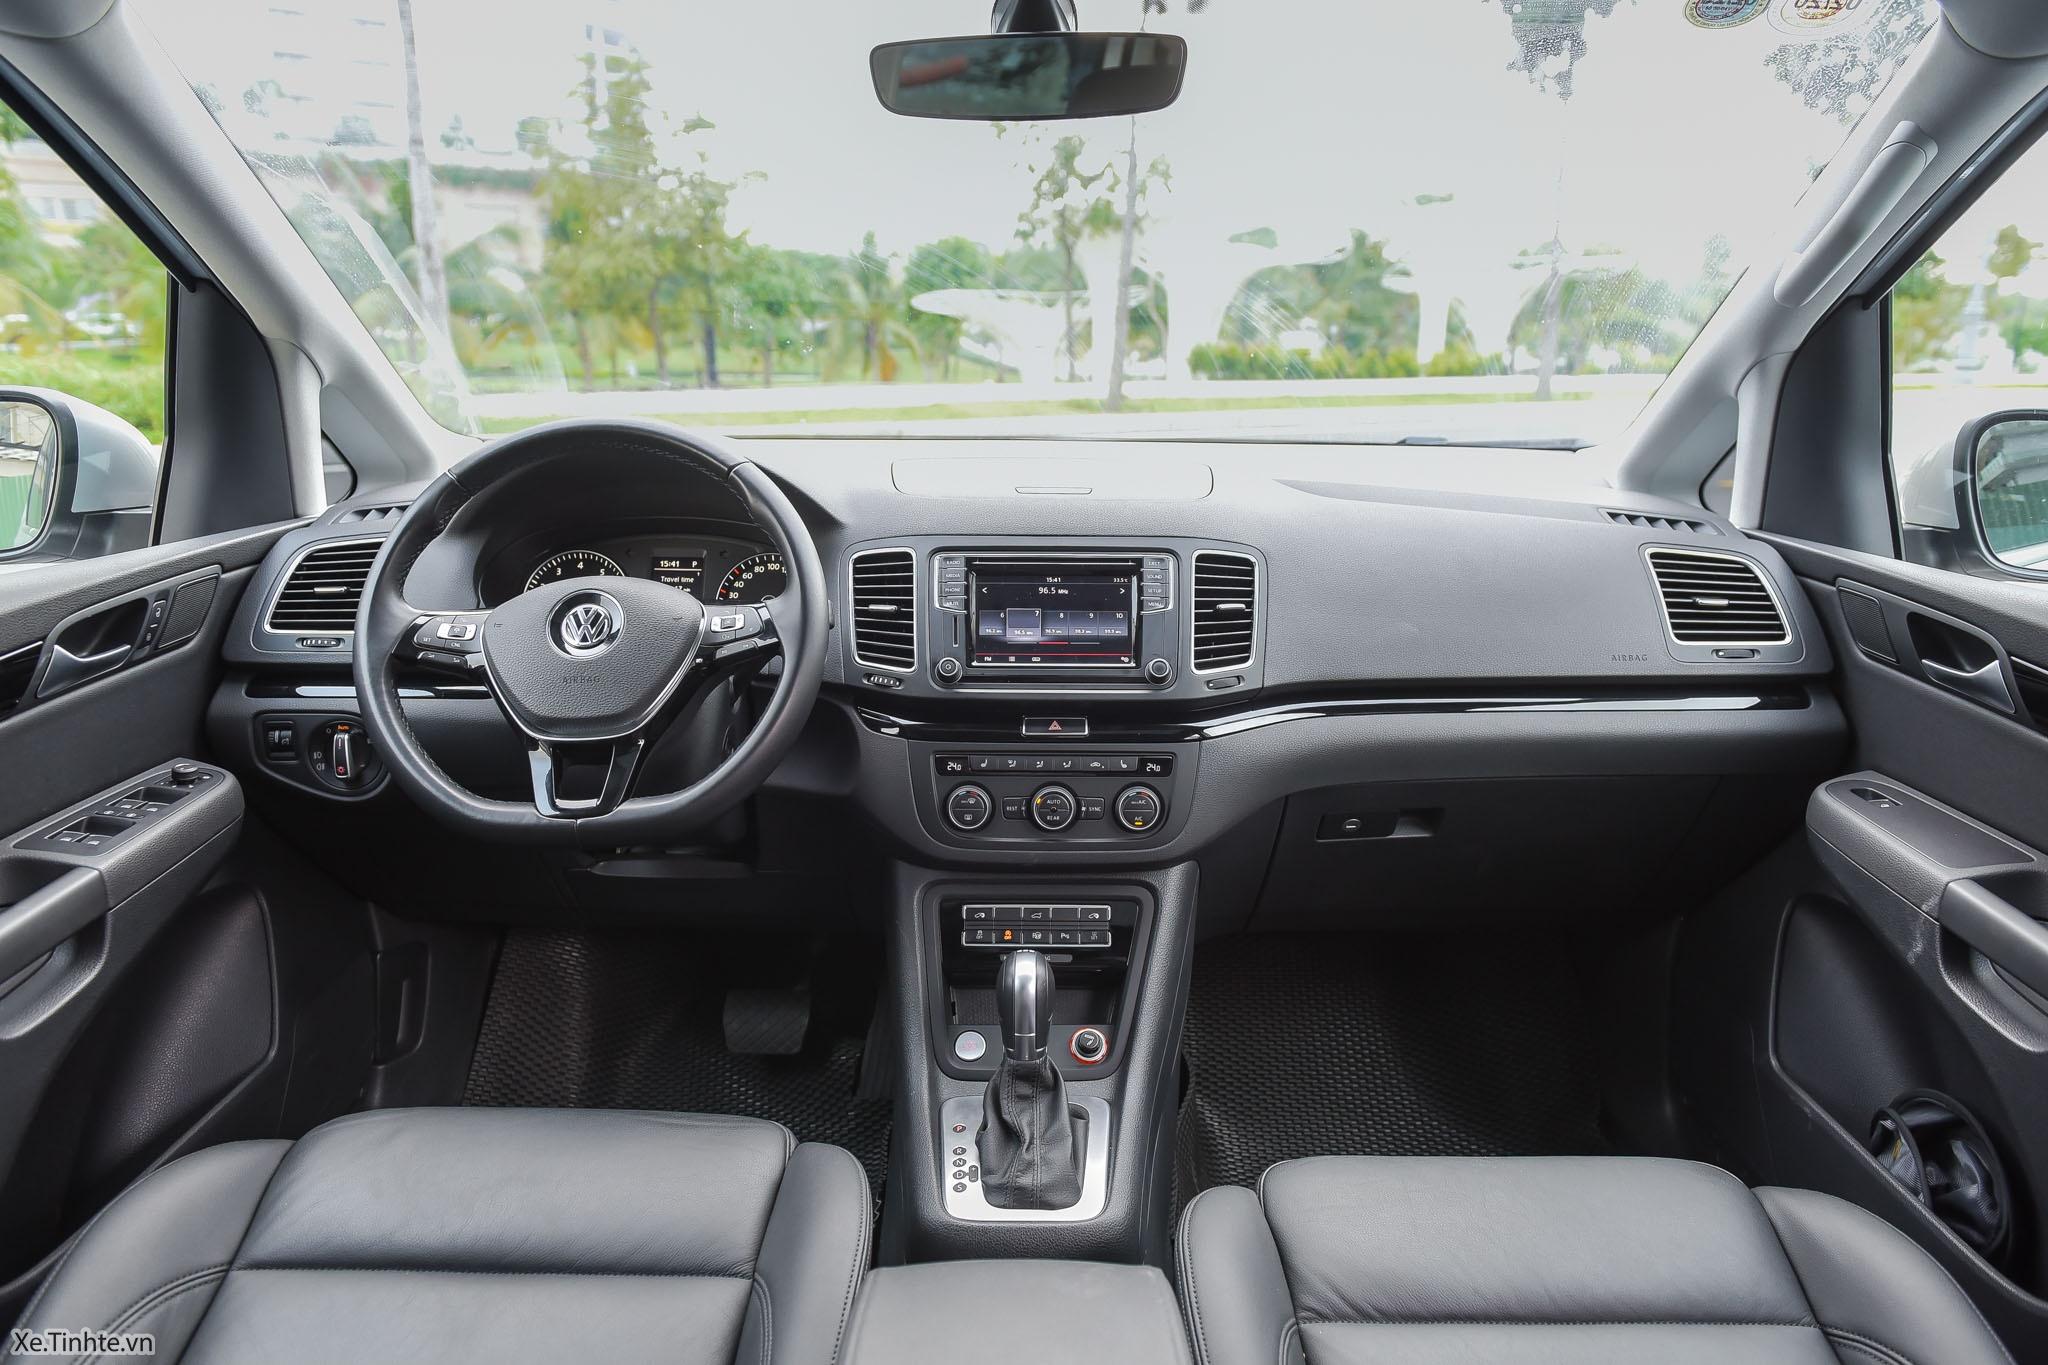 Volkswagen_Sharan_Xe_Tinhte_029.jpg